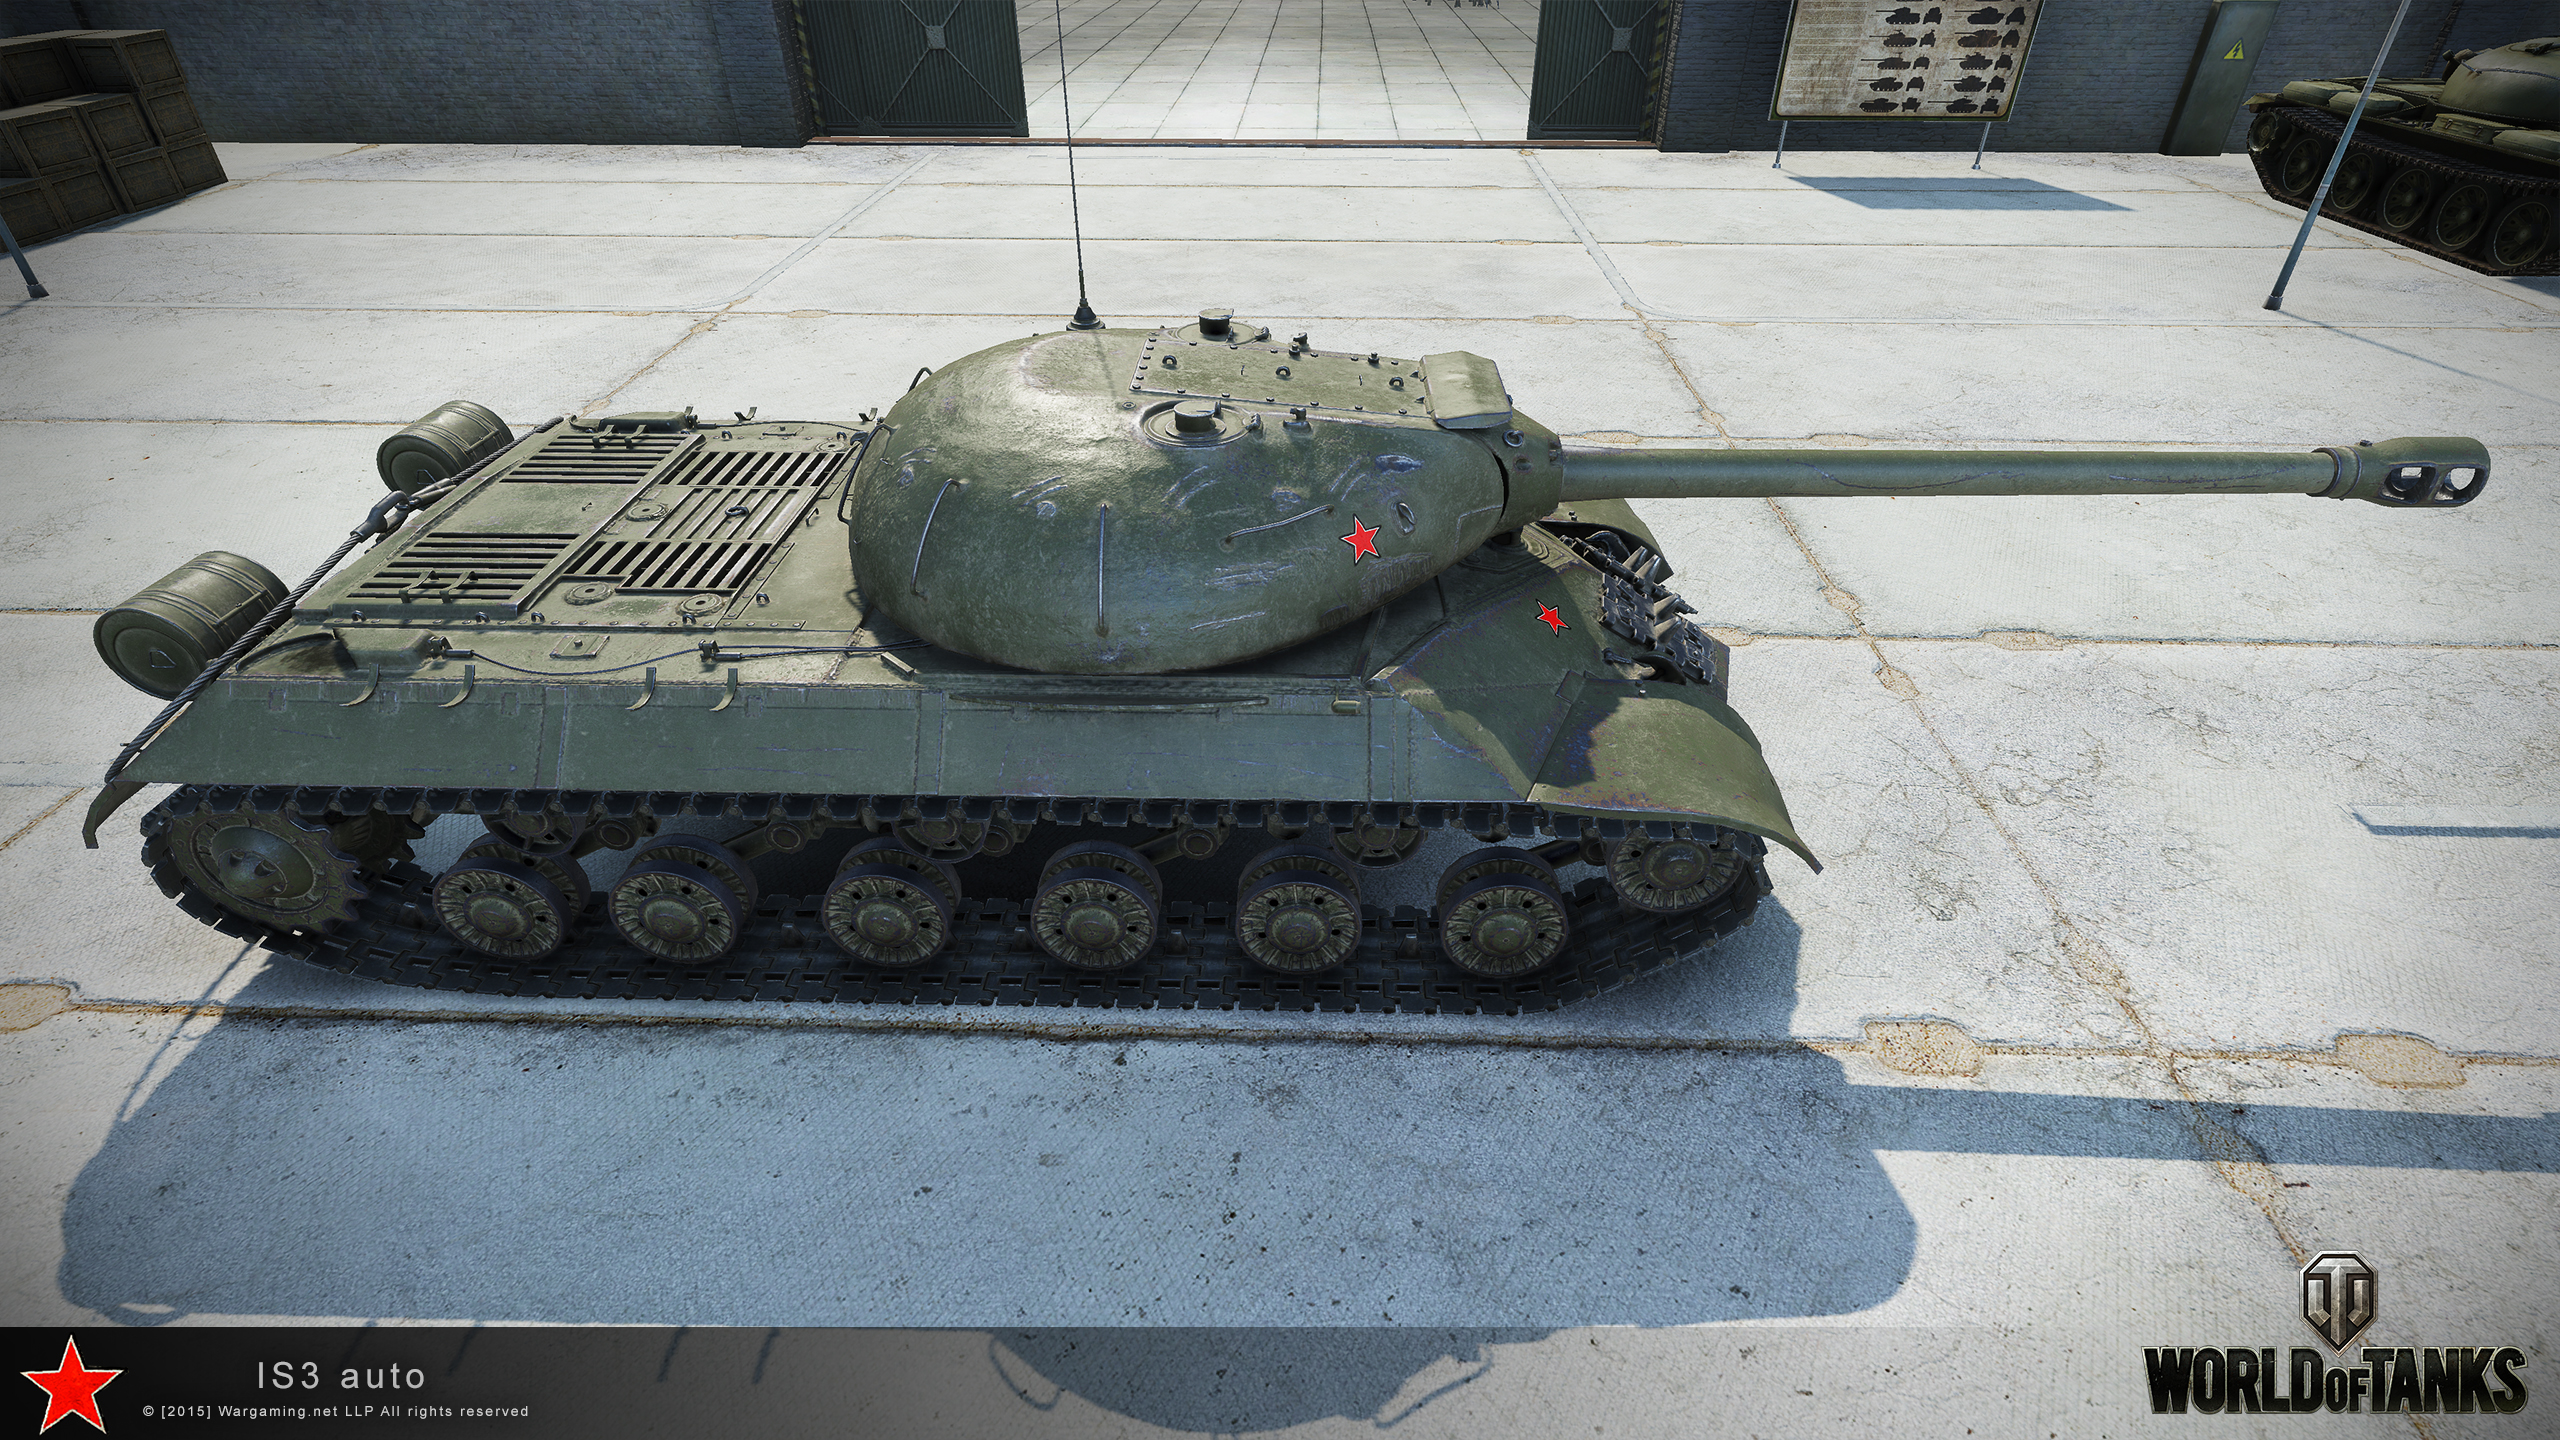 Ağır Sovyet tankı IS-3. IP-3, World of Tanks Kılavuzu